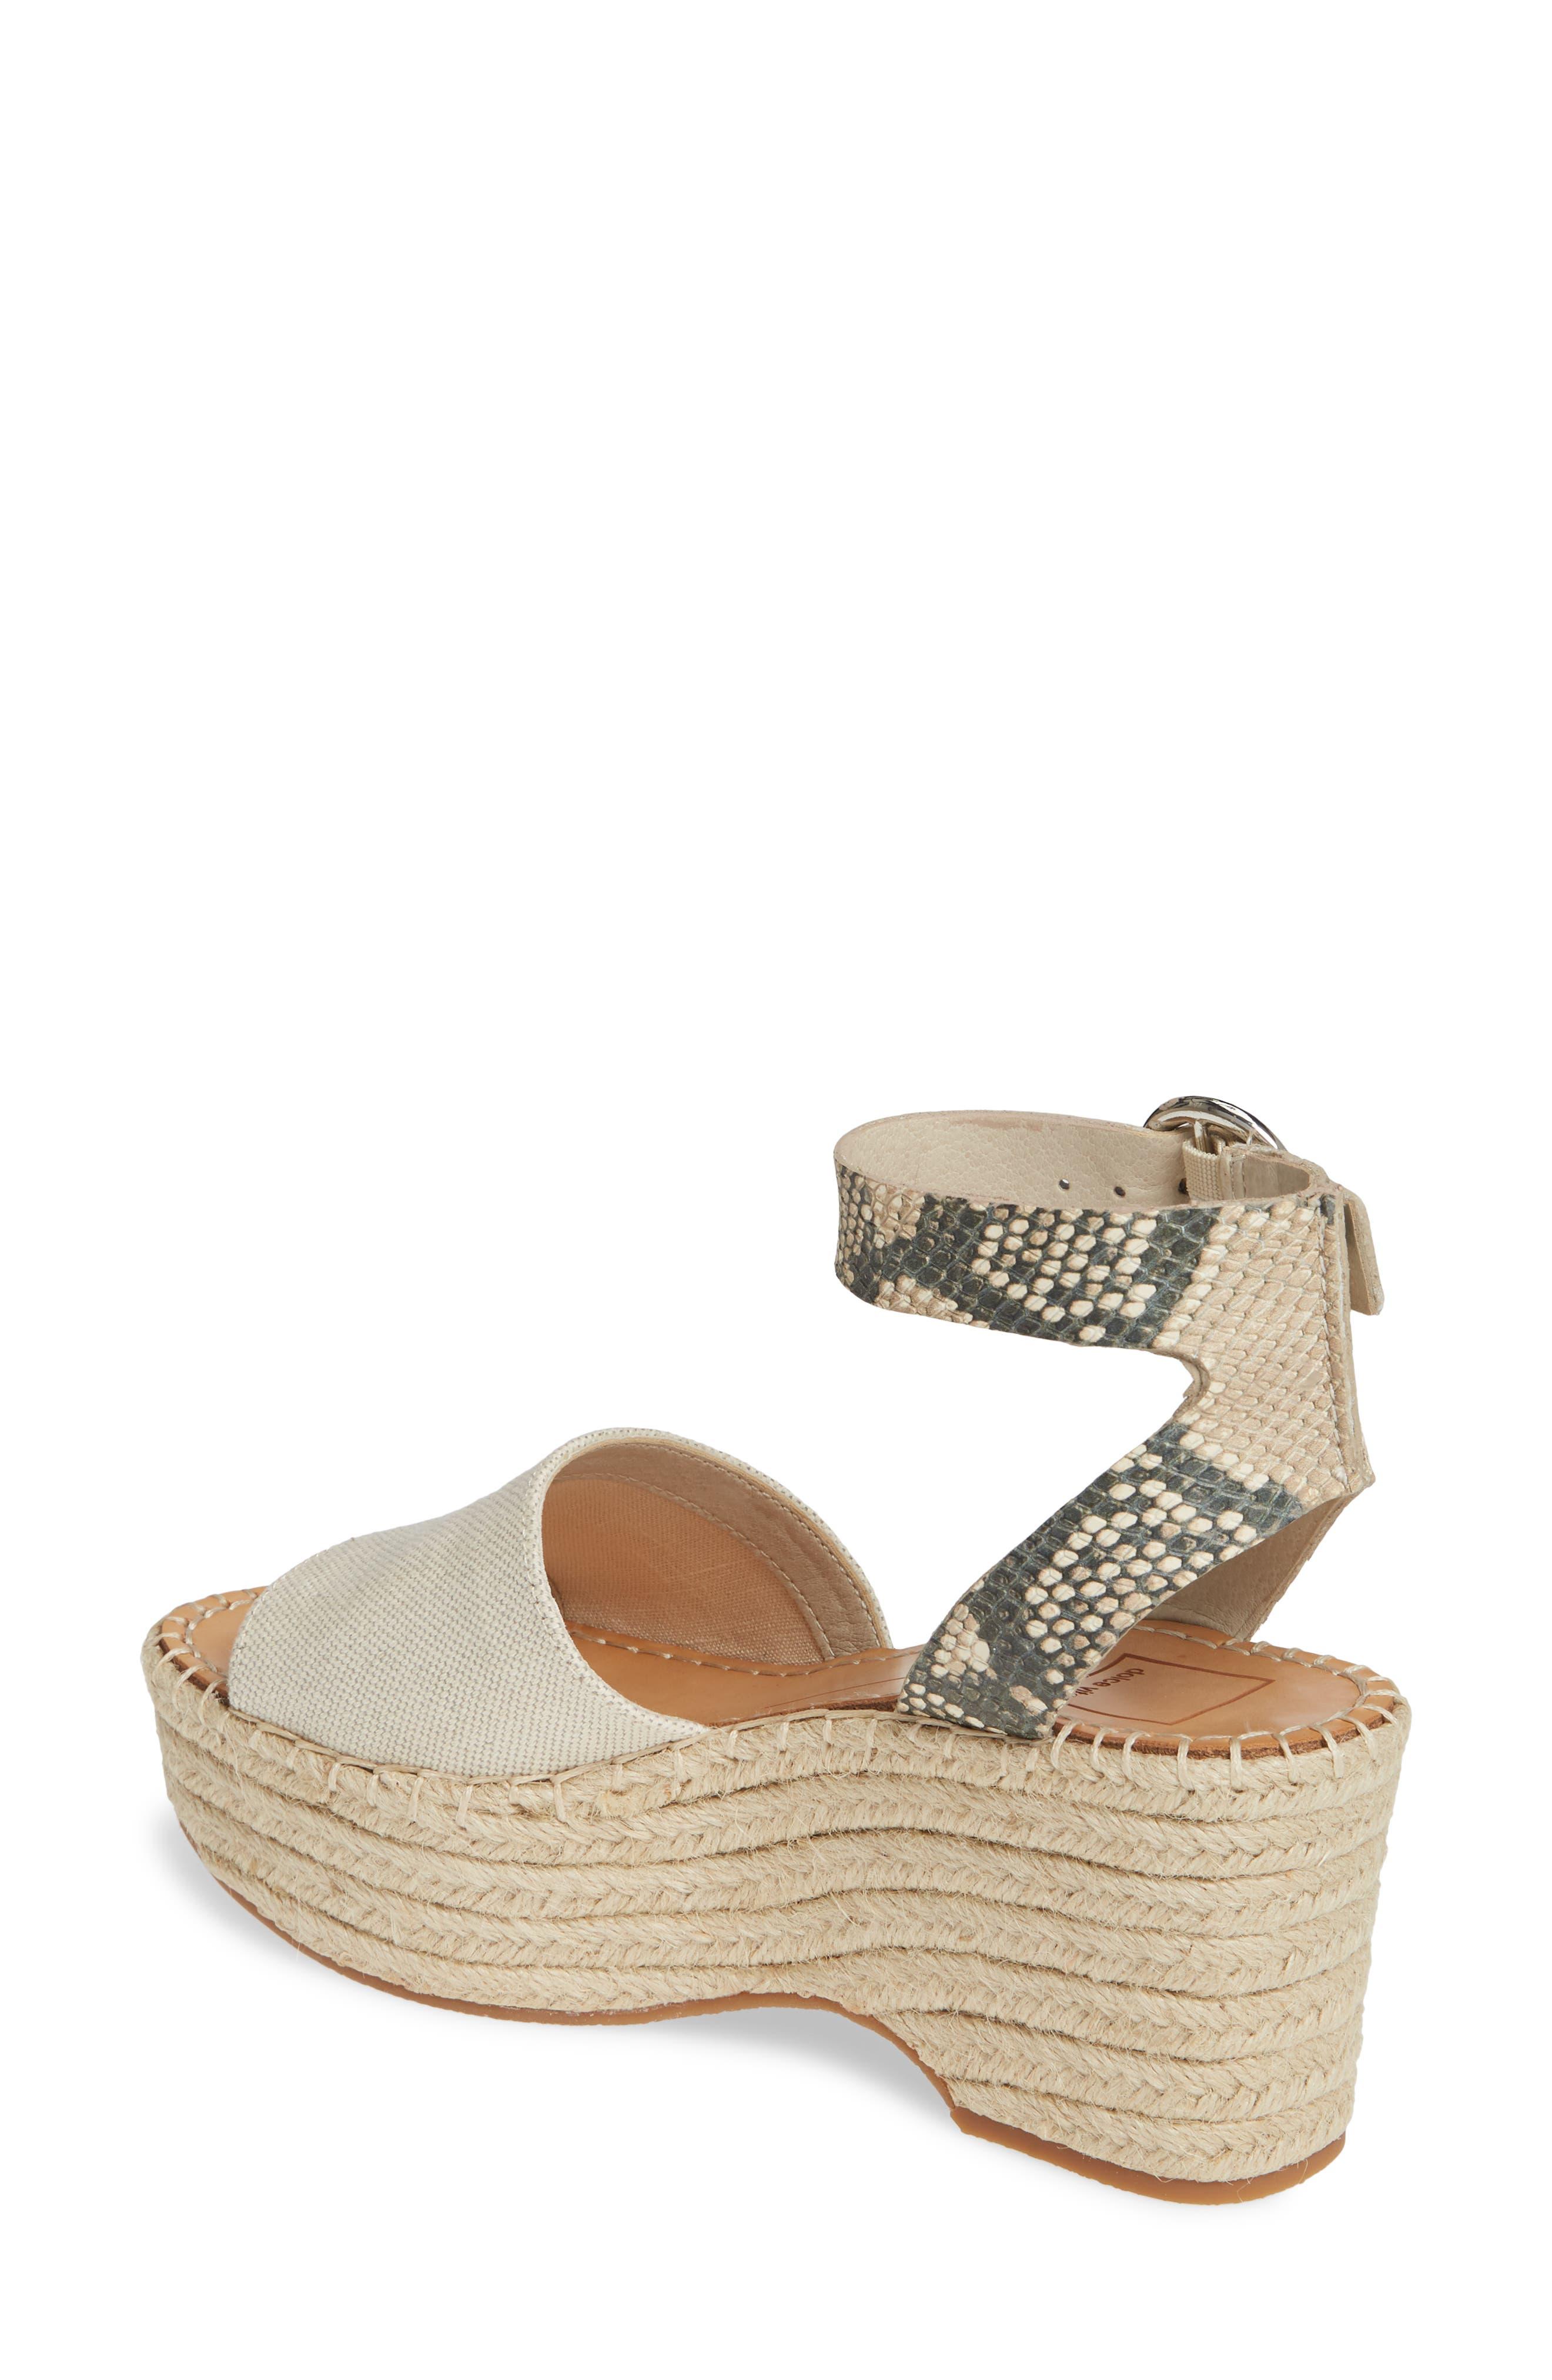 ,                             Lesly Espadrille Platform Sandal,                             Alternate thumbnail 2, color,                             NATURAL FABRIC